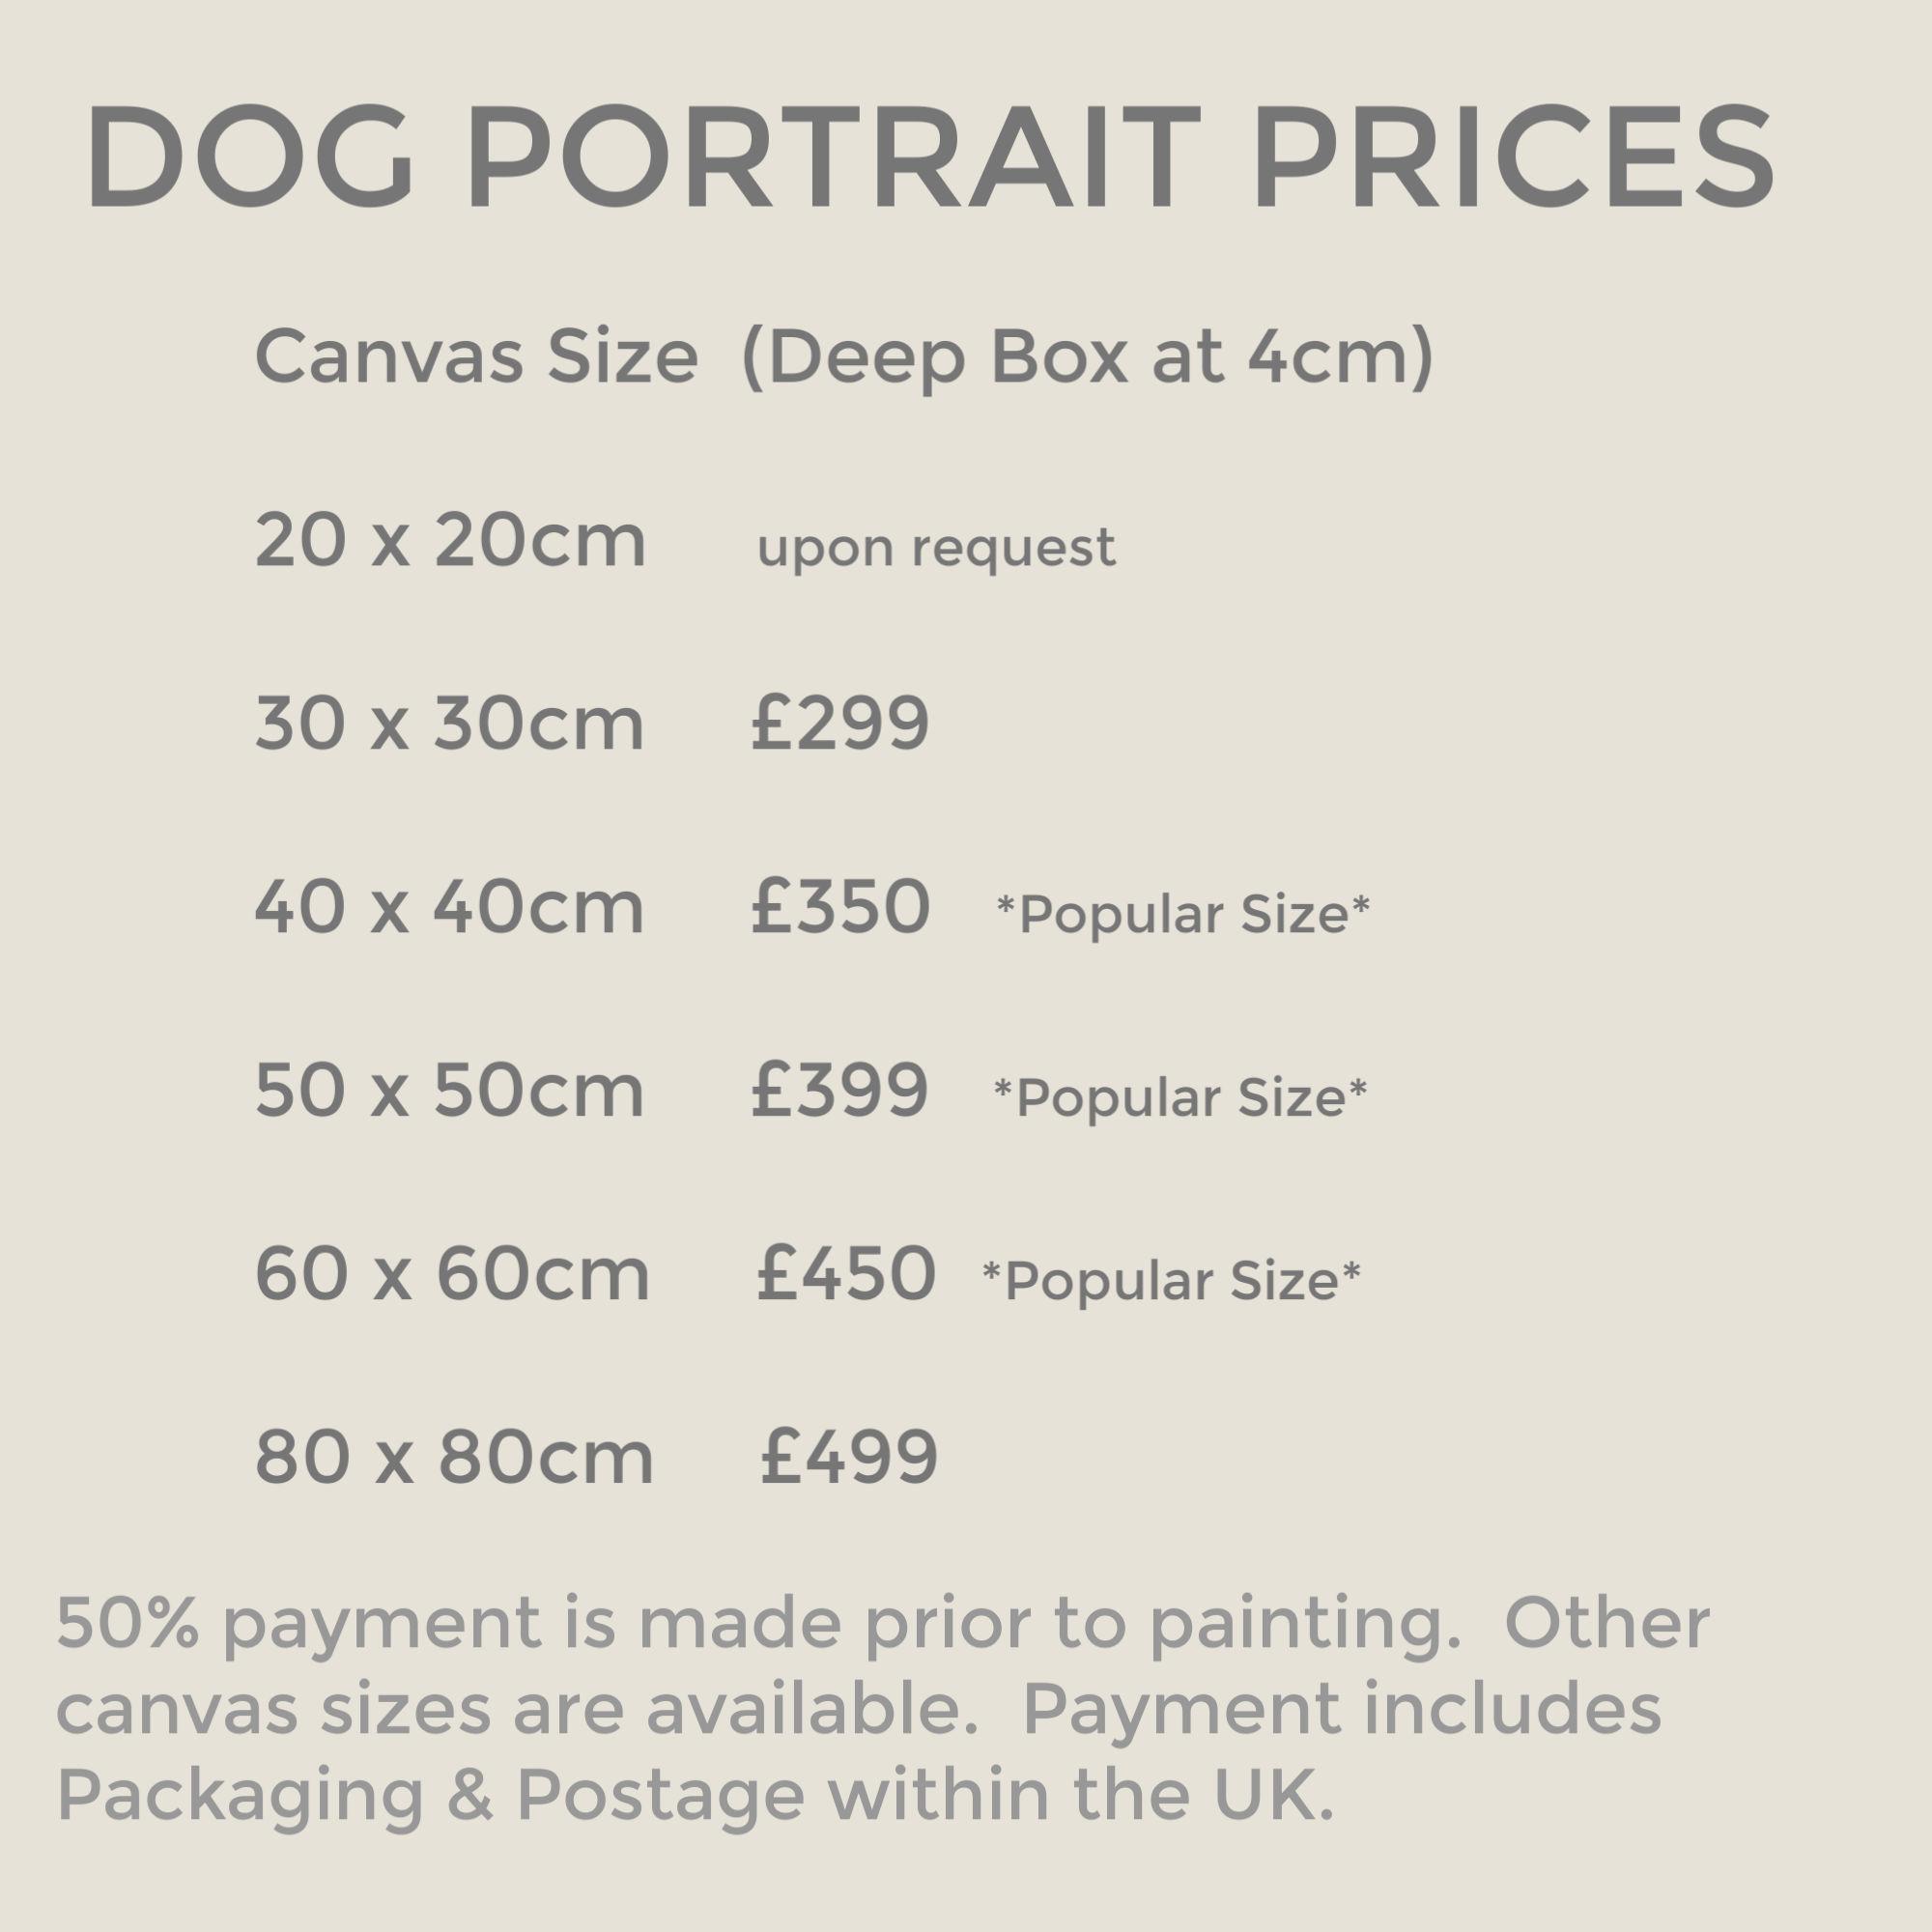 Dog Portrait Prices 2019.jpg ipaintdogs